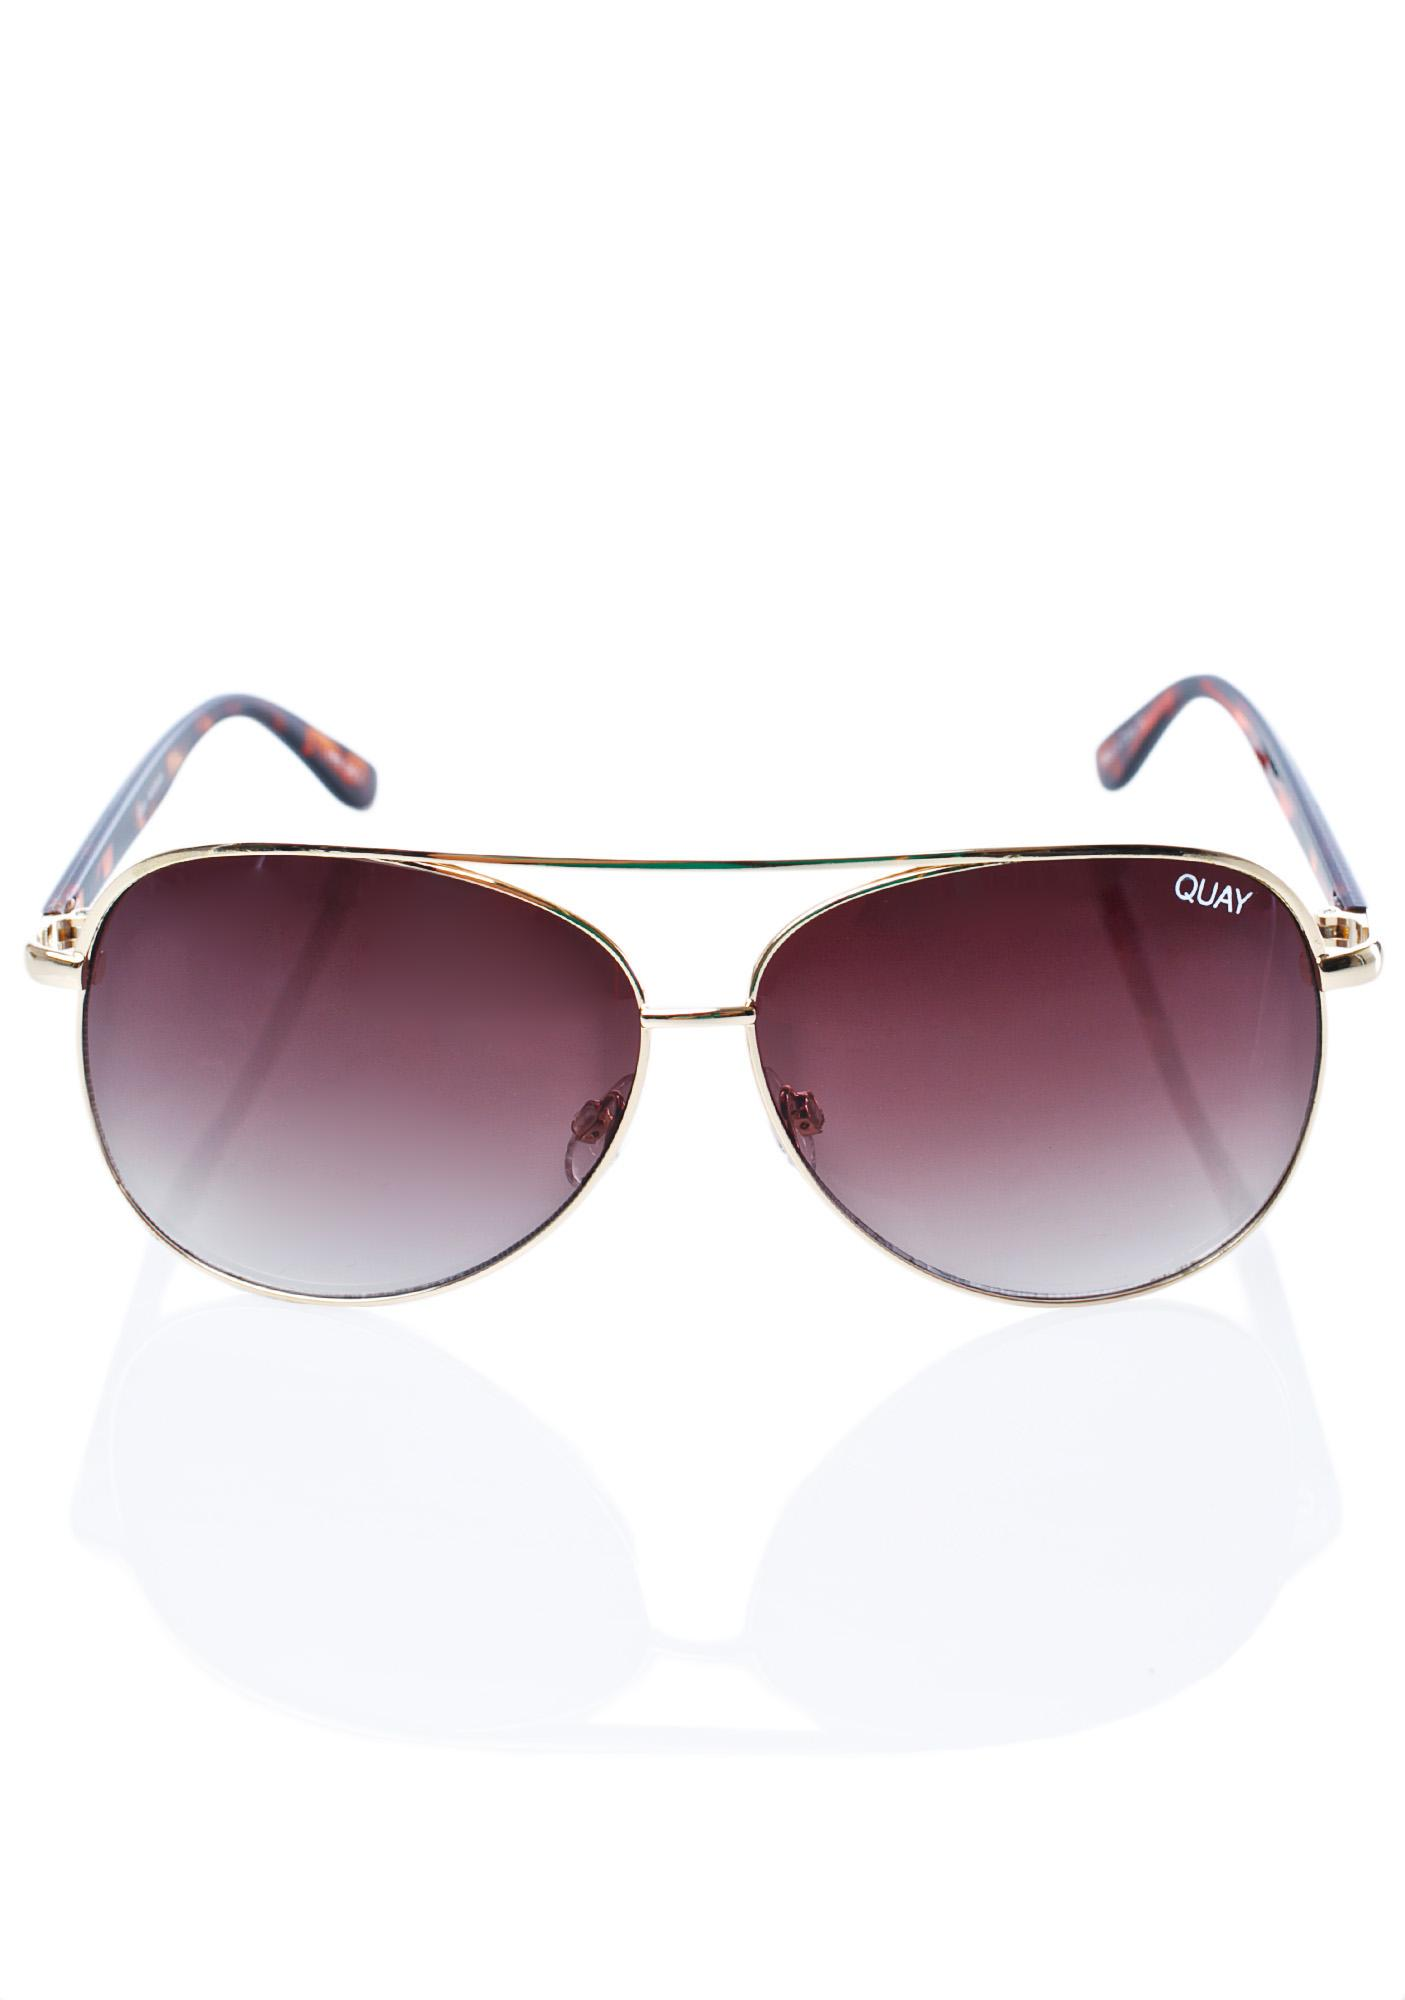 Quay Eyeware Macaw Sunglasses